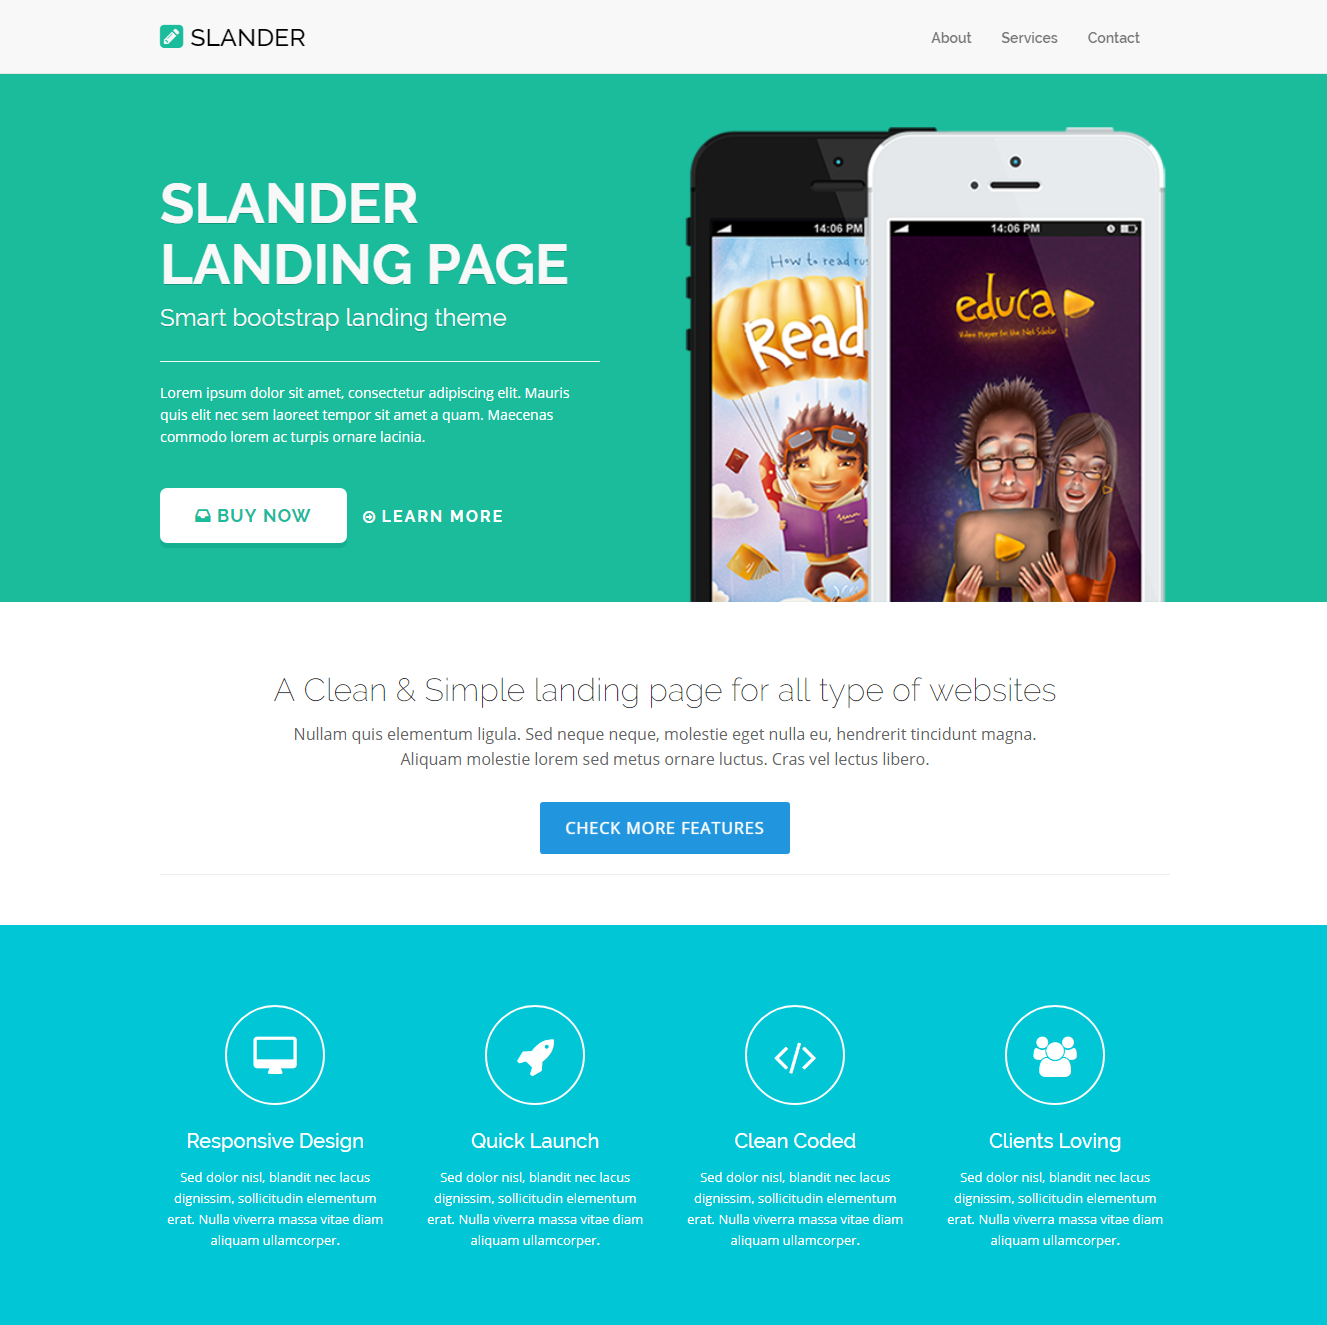 HTML Bootstrap Slander Templates